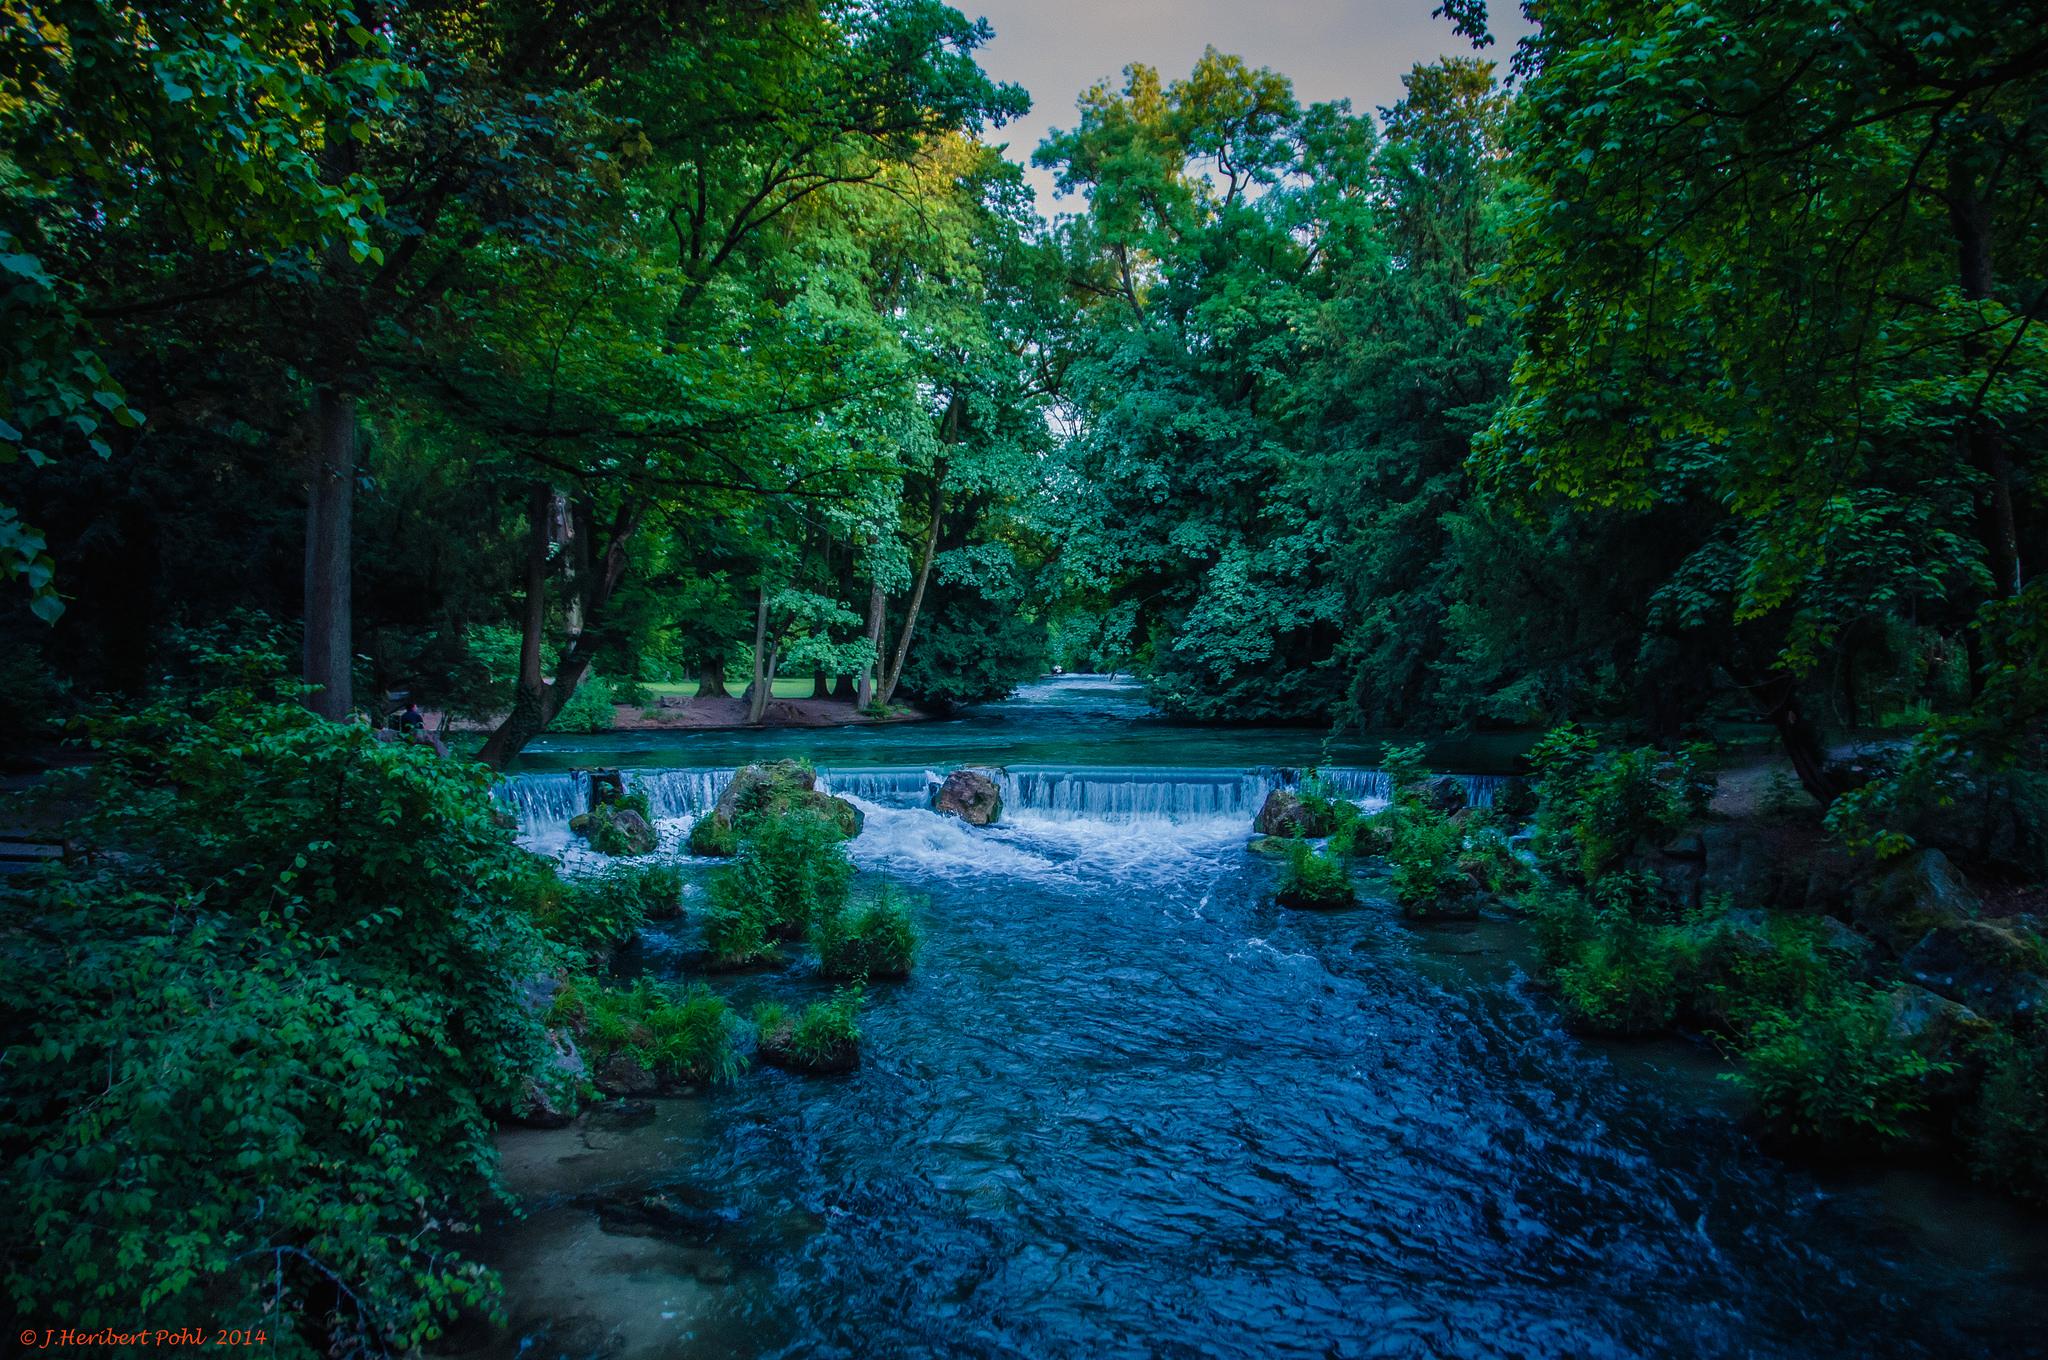 Natur mitten in der Stadt: München gilt als lebenswert. Foto: J. Heribert Pohl (Lizenz: CC BY-SA 2.0)